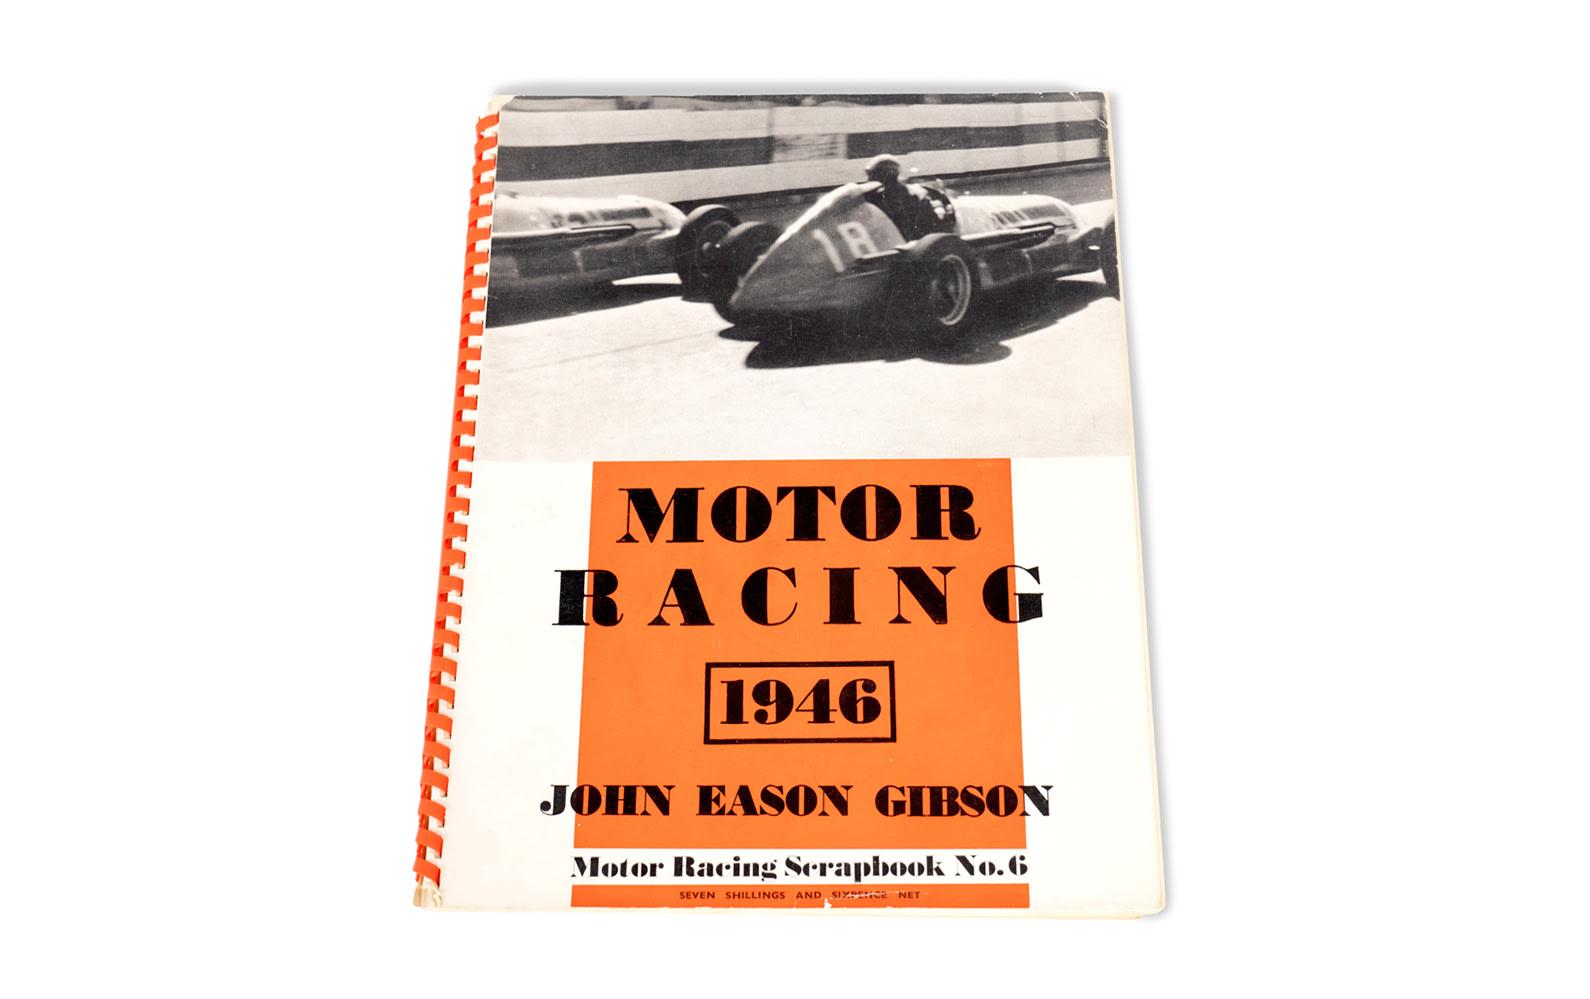 1946 Motor Racing Scrapbook No. 6 by John Eason Gibson